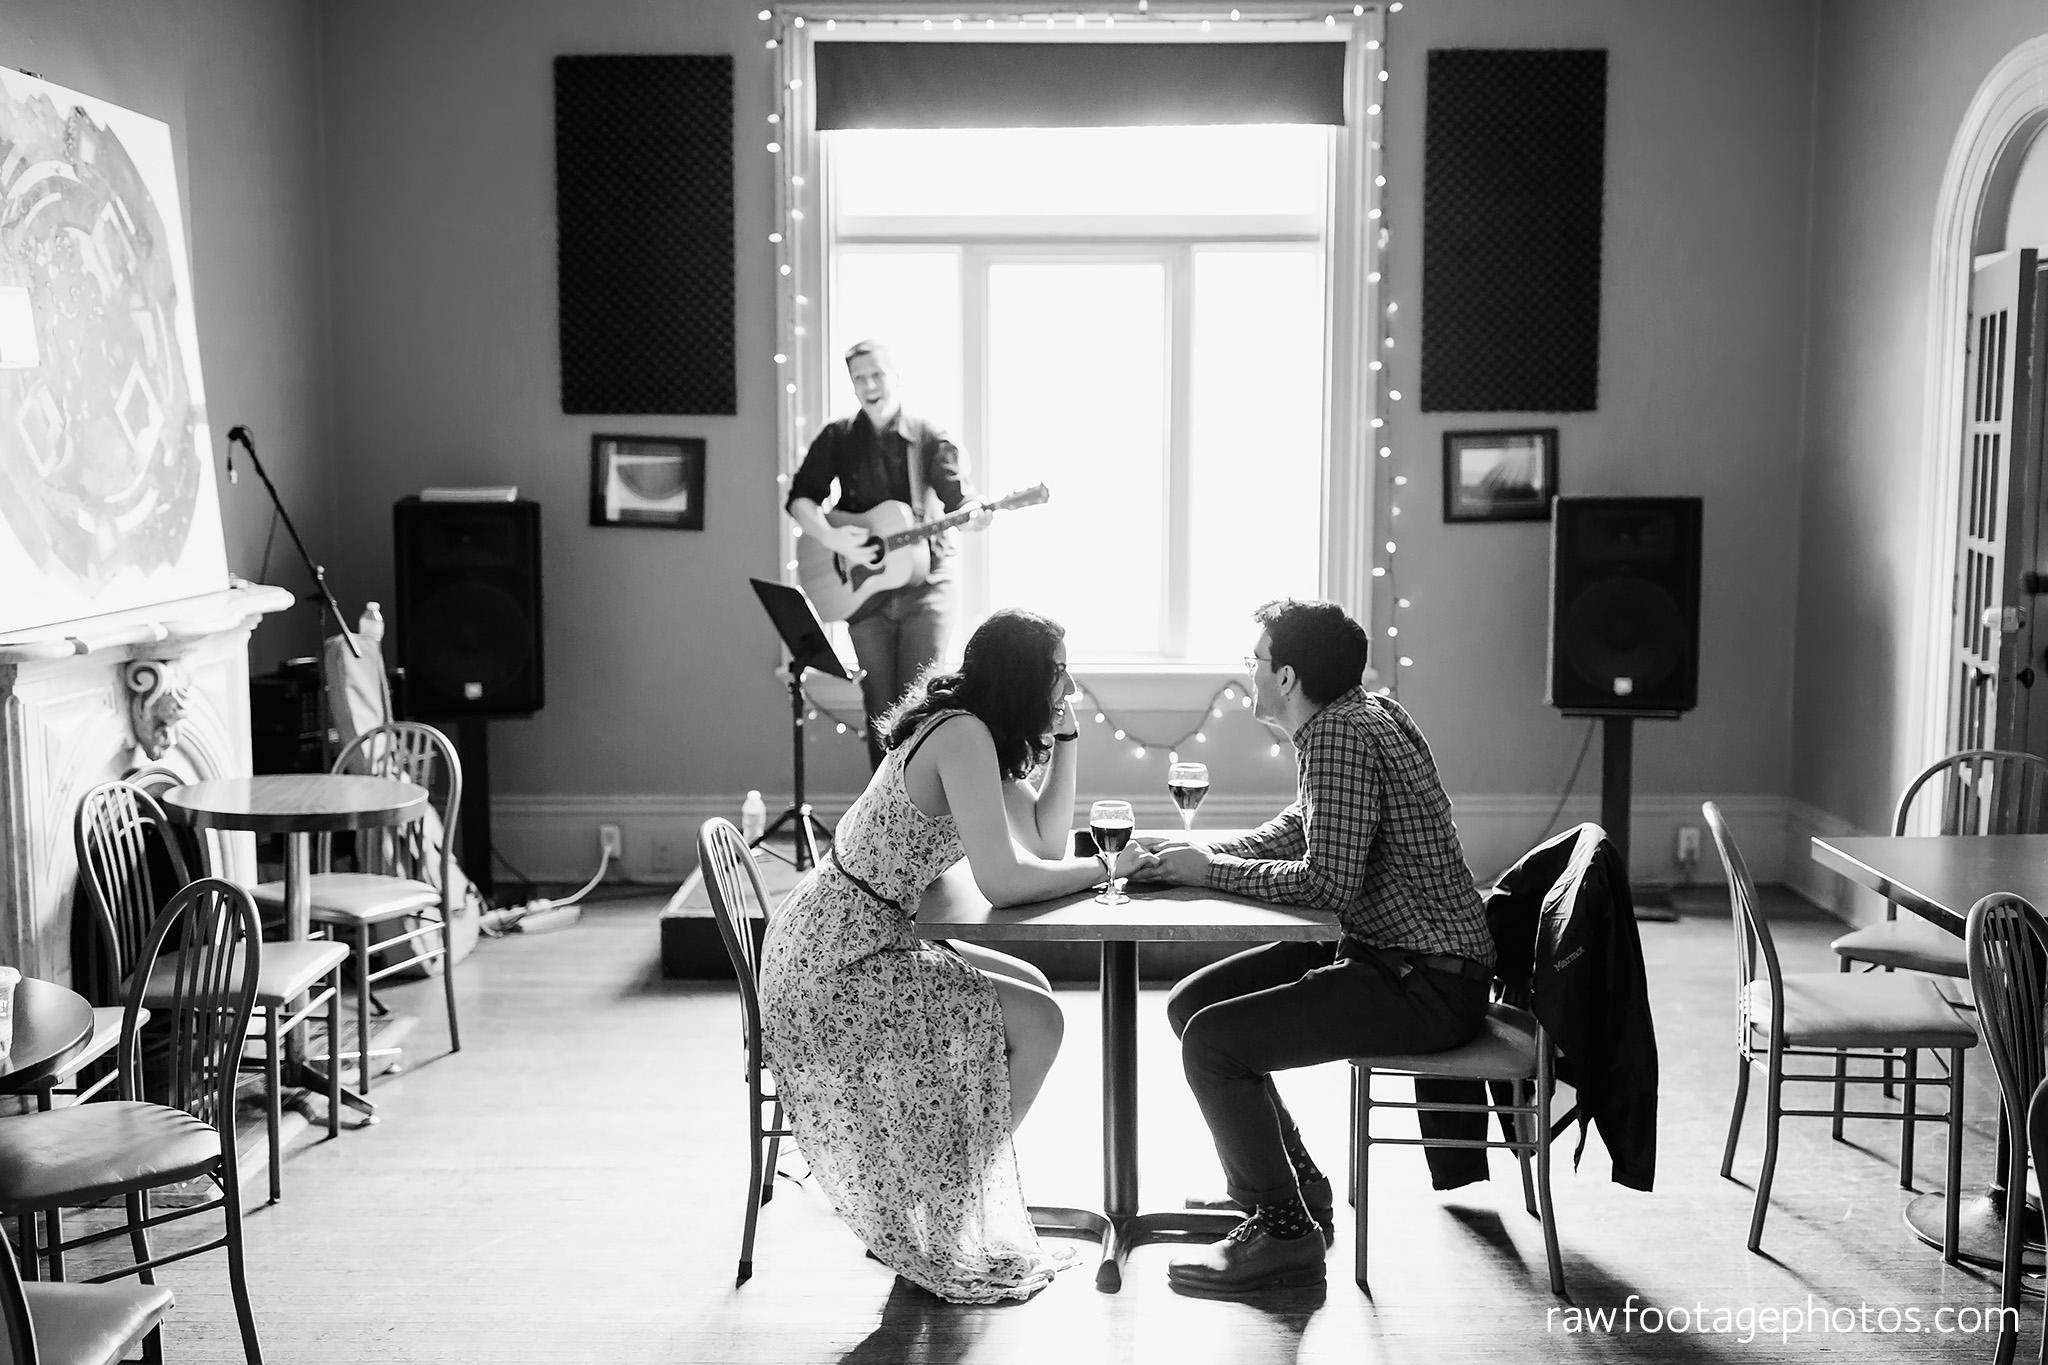 london_ontario_photographer-proposal_photographer-surprise_proposal-london_music_club-raw_footage_photography-wedding_photographer007.jpg